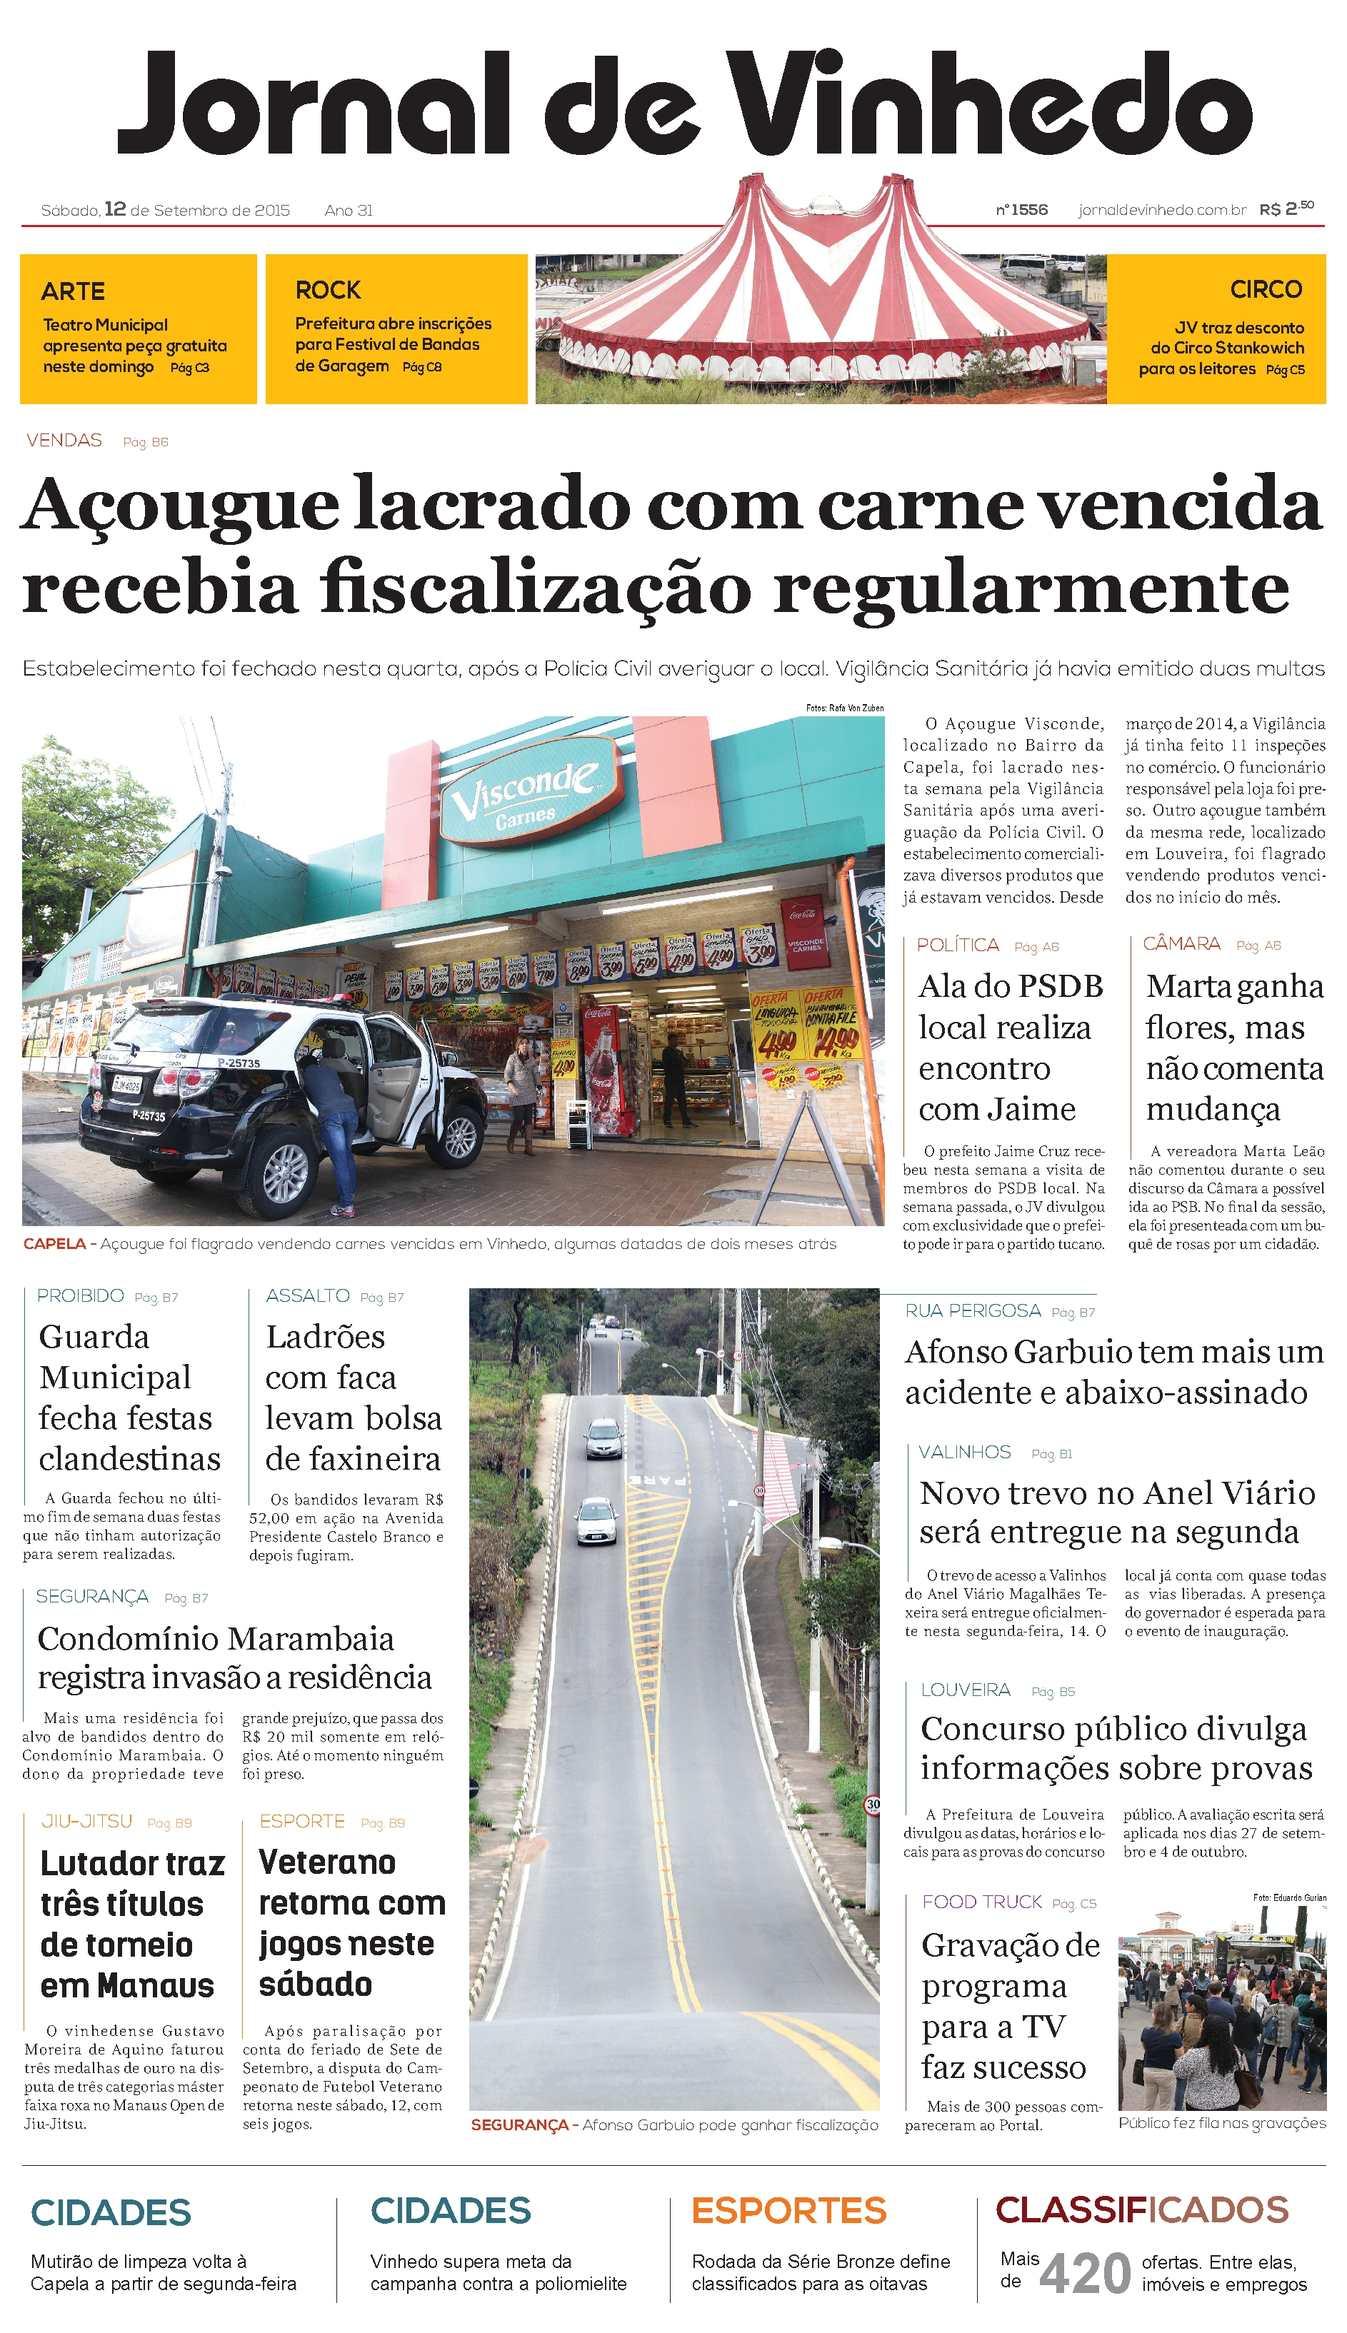 30bd5e19c11e9 Calaméo - Jornal De Vinhedo Sábado, 12 De Setembro De 2015 Edic 1556